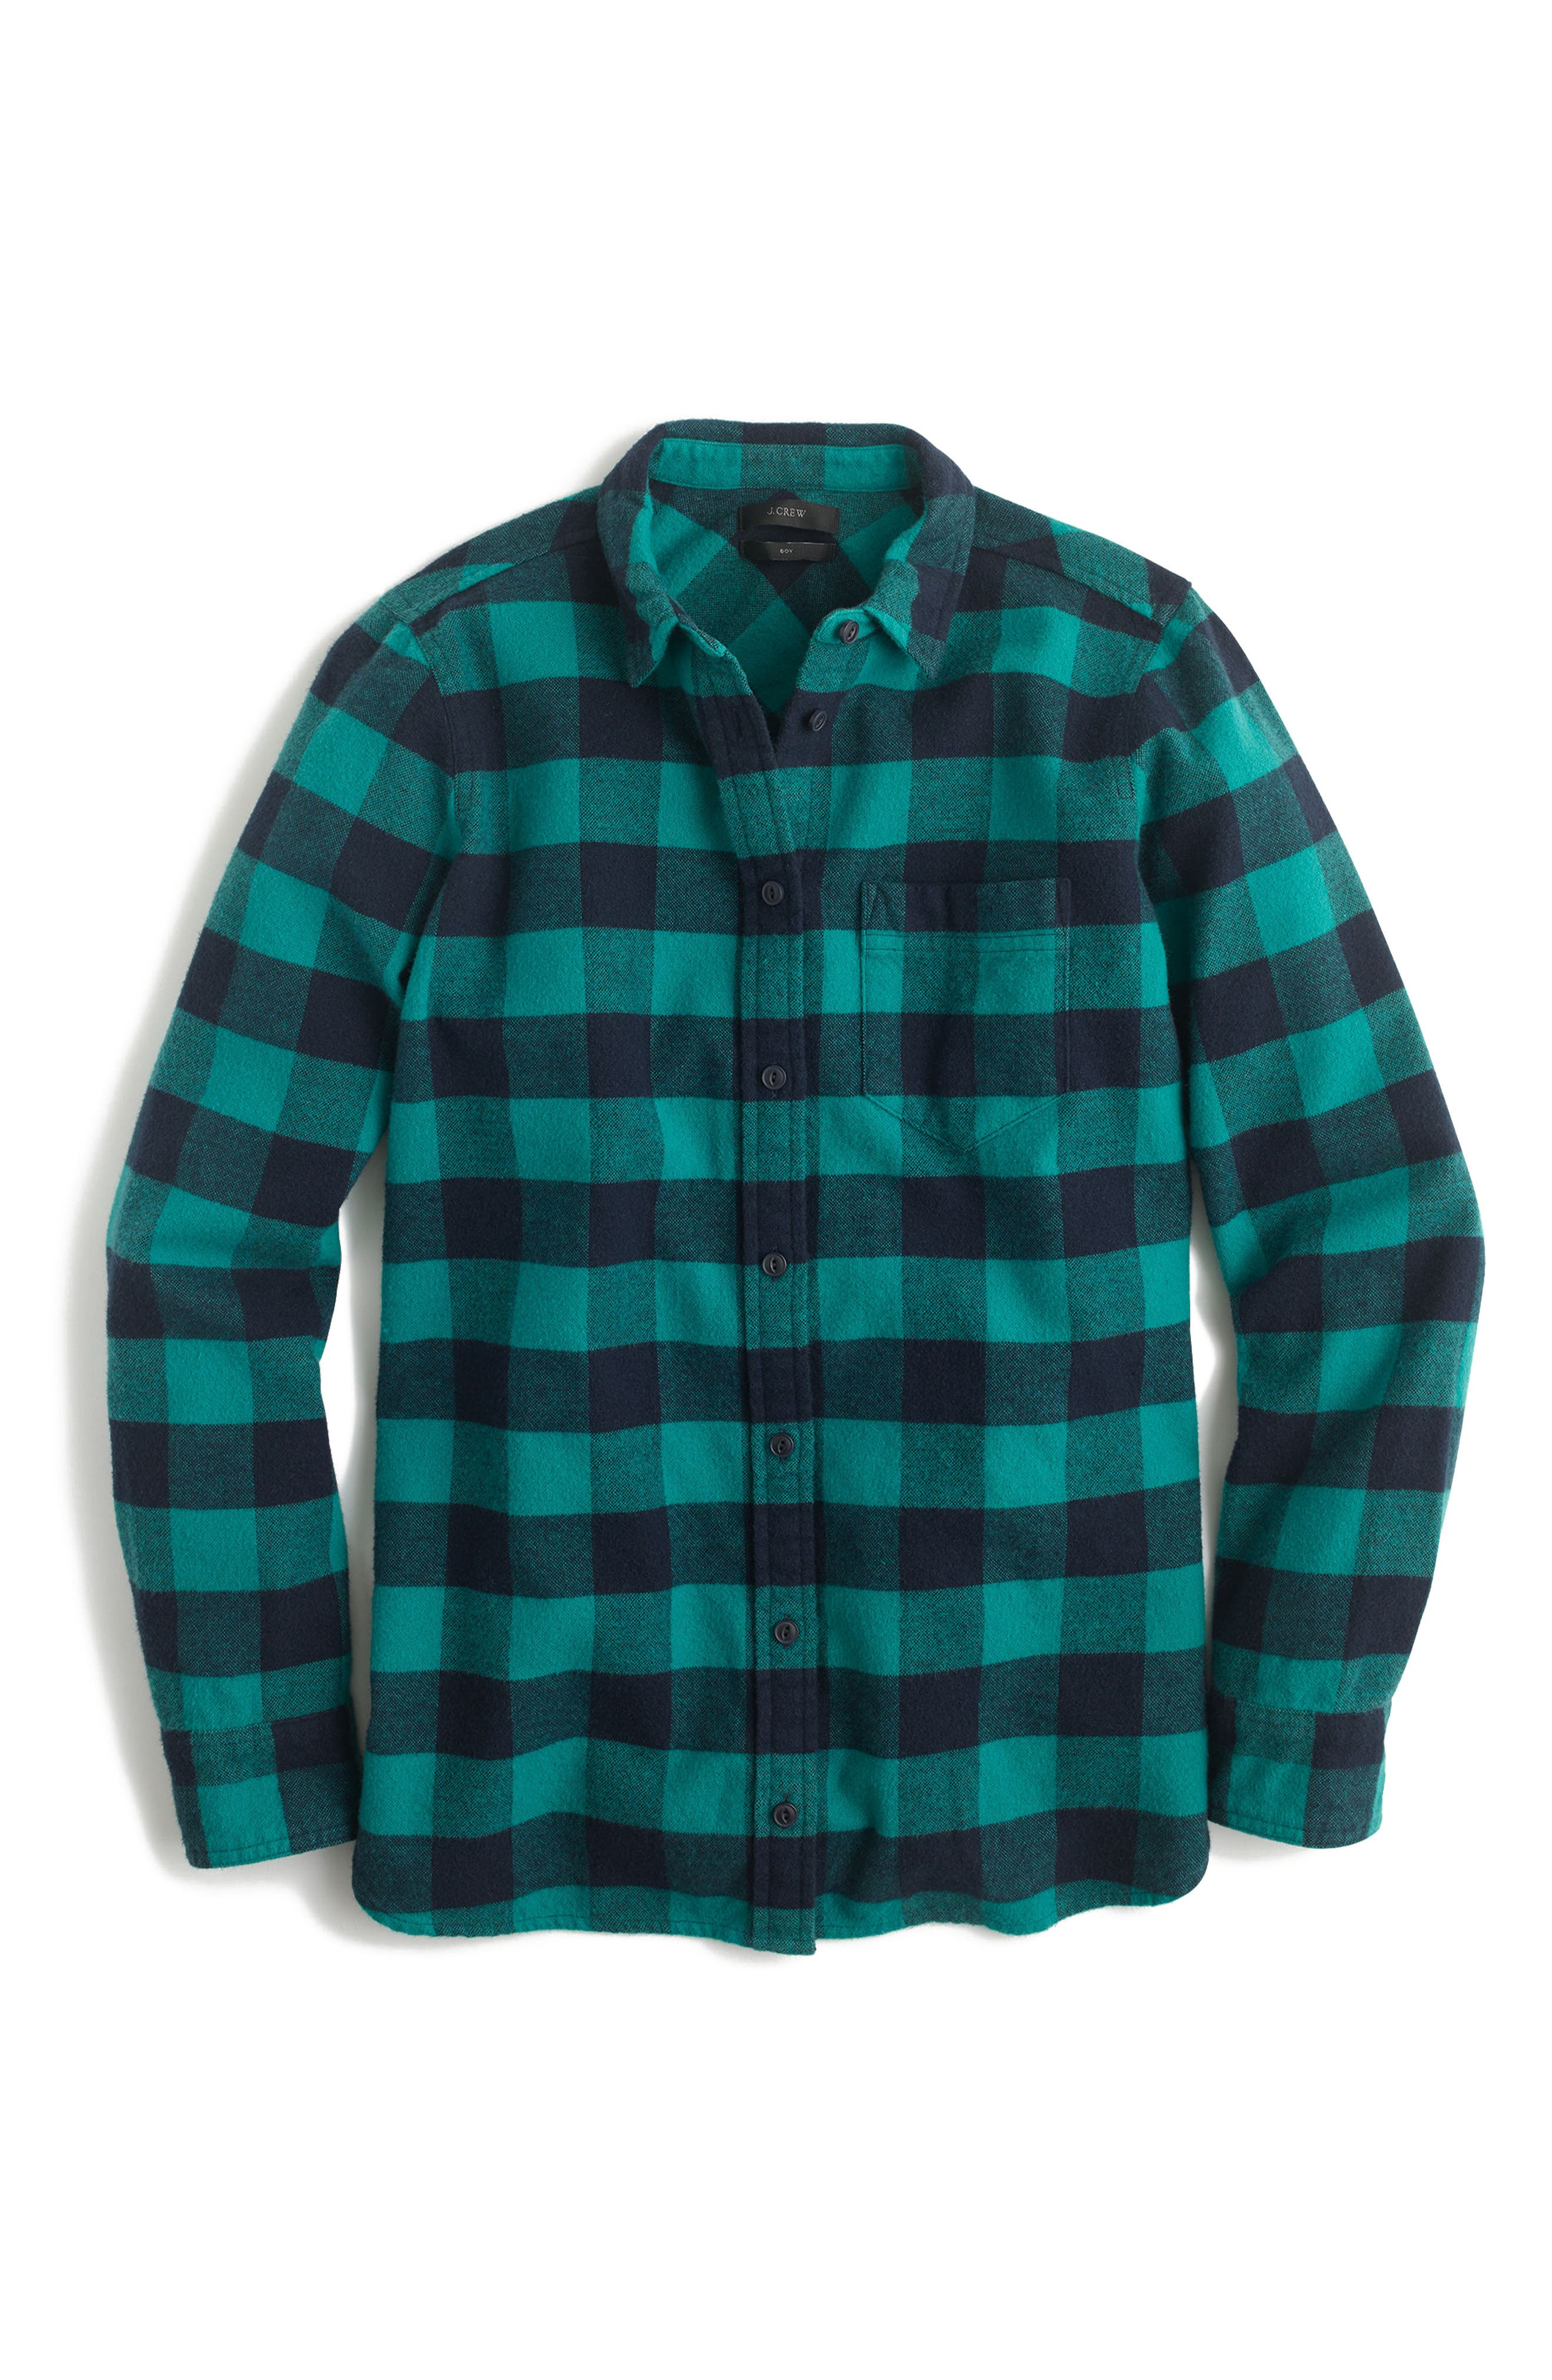 J.Crew Buffalo Check Cotton & Wool Boy Shirt (Regular & Petite)